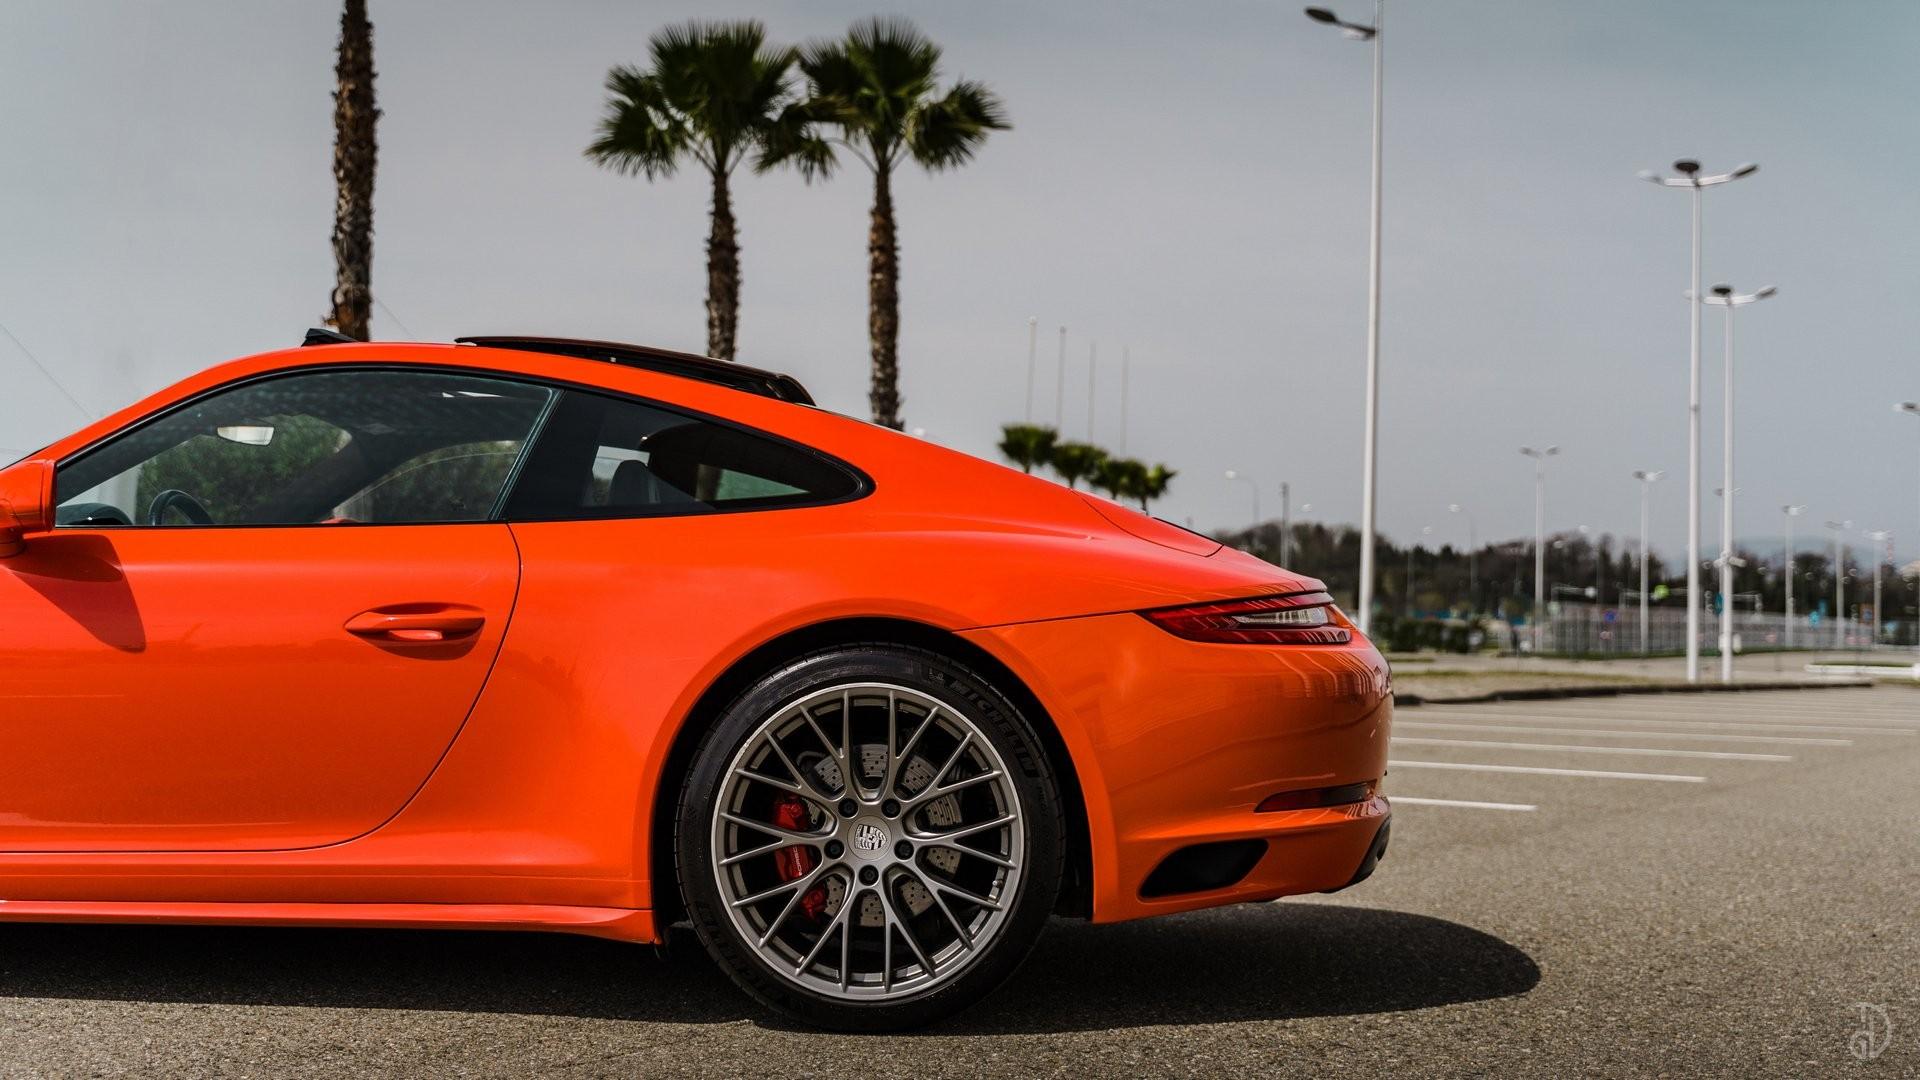 Аренда Porsche 911 Carrera 4S в Сочи. Фото 5